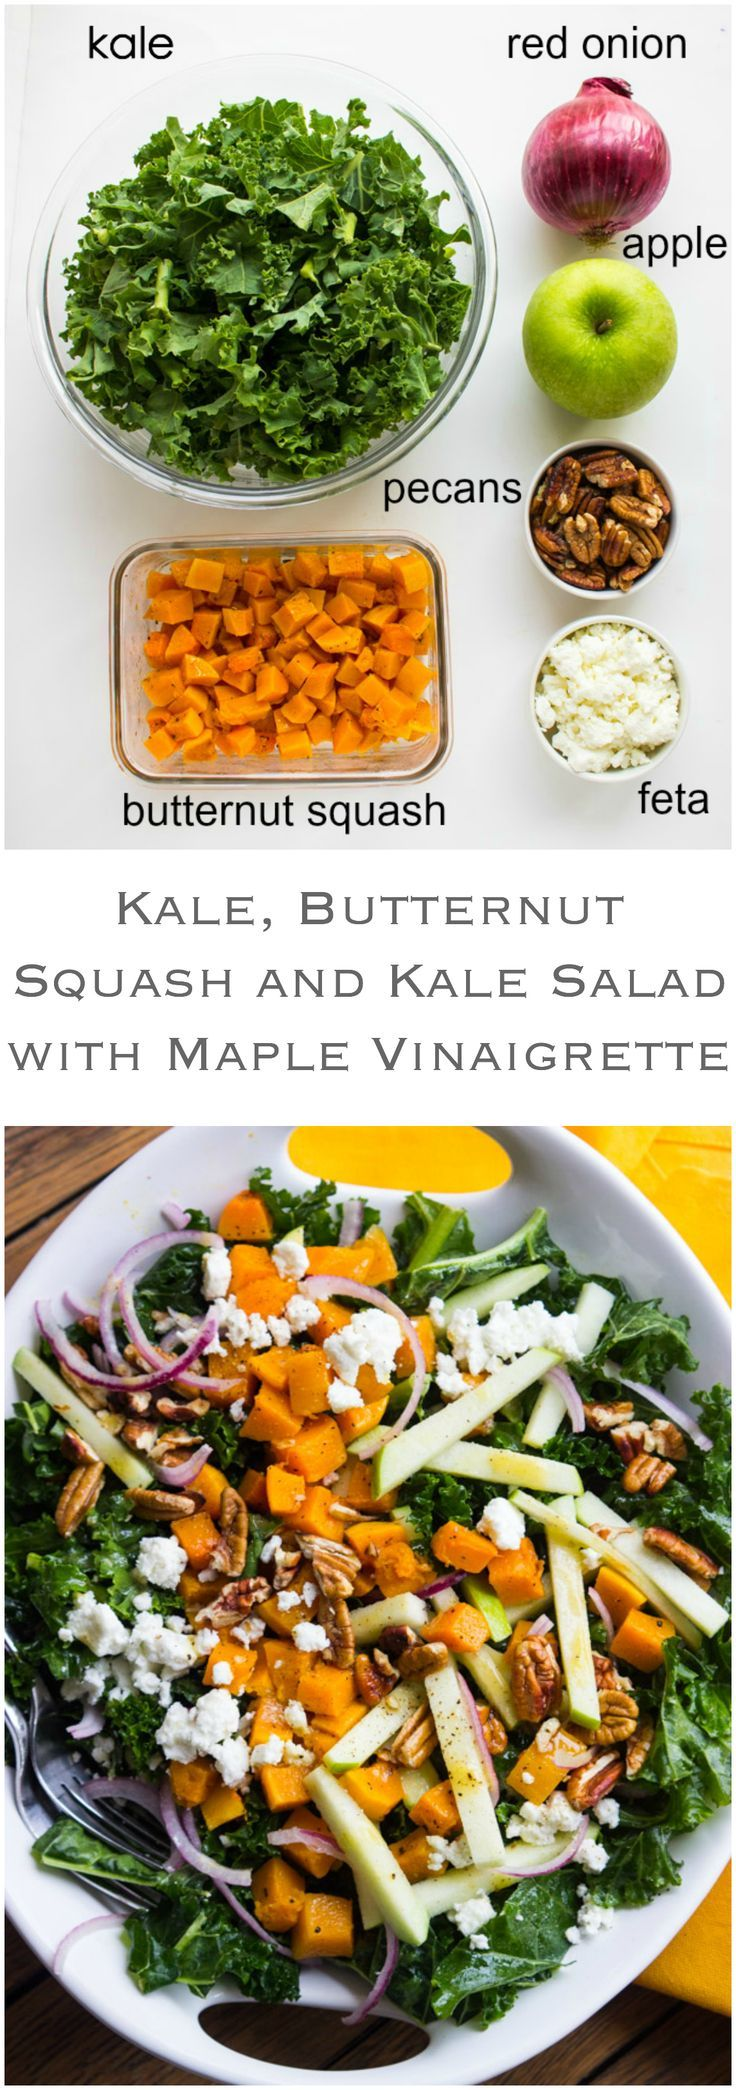 Kale, Butternut Squash and Apple Salad - healthy kale greens with roasted butternut squash and tart apple, tossed with feta, pecans in a zesty-sweet maple vinaigrette | littlebroken.com @littlebroken